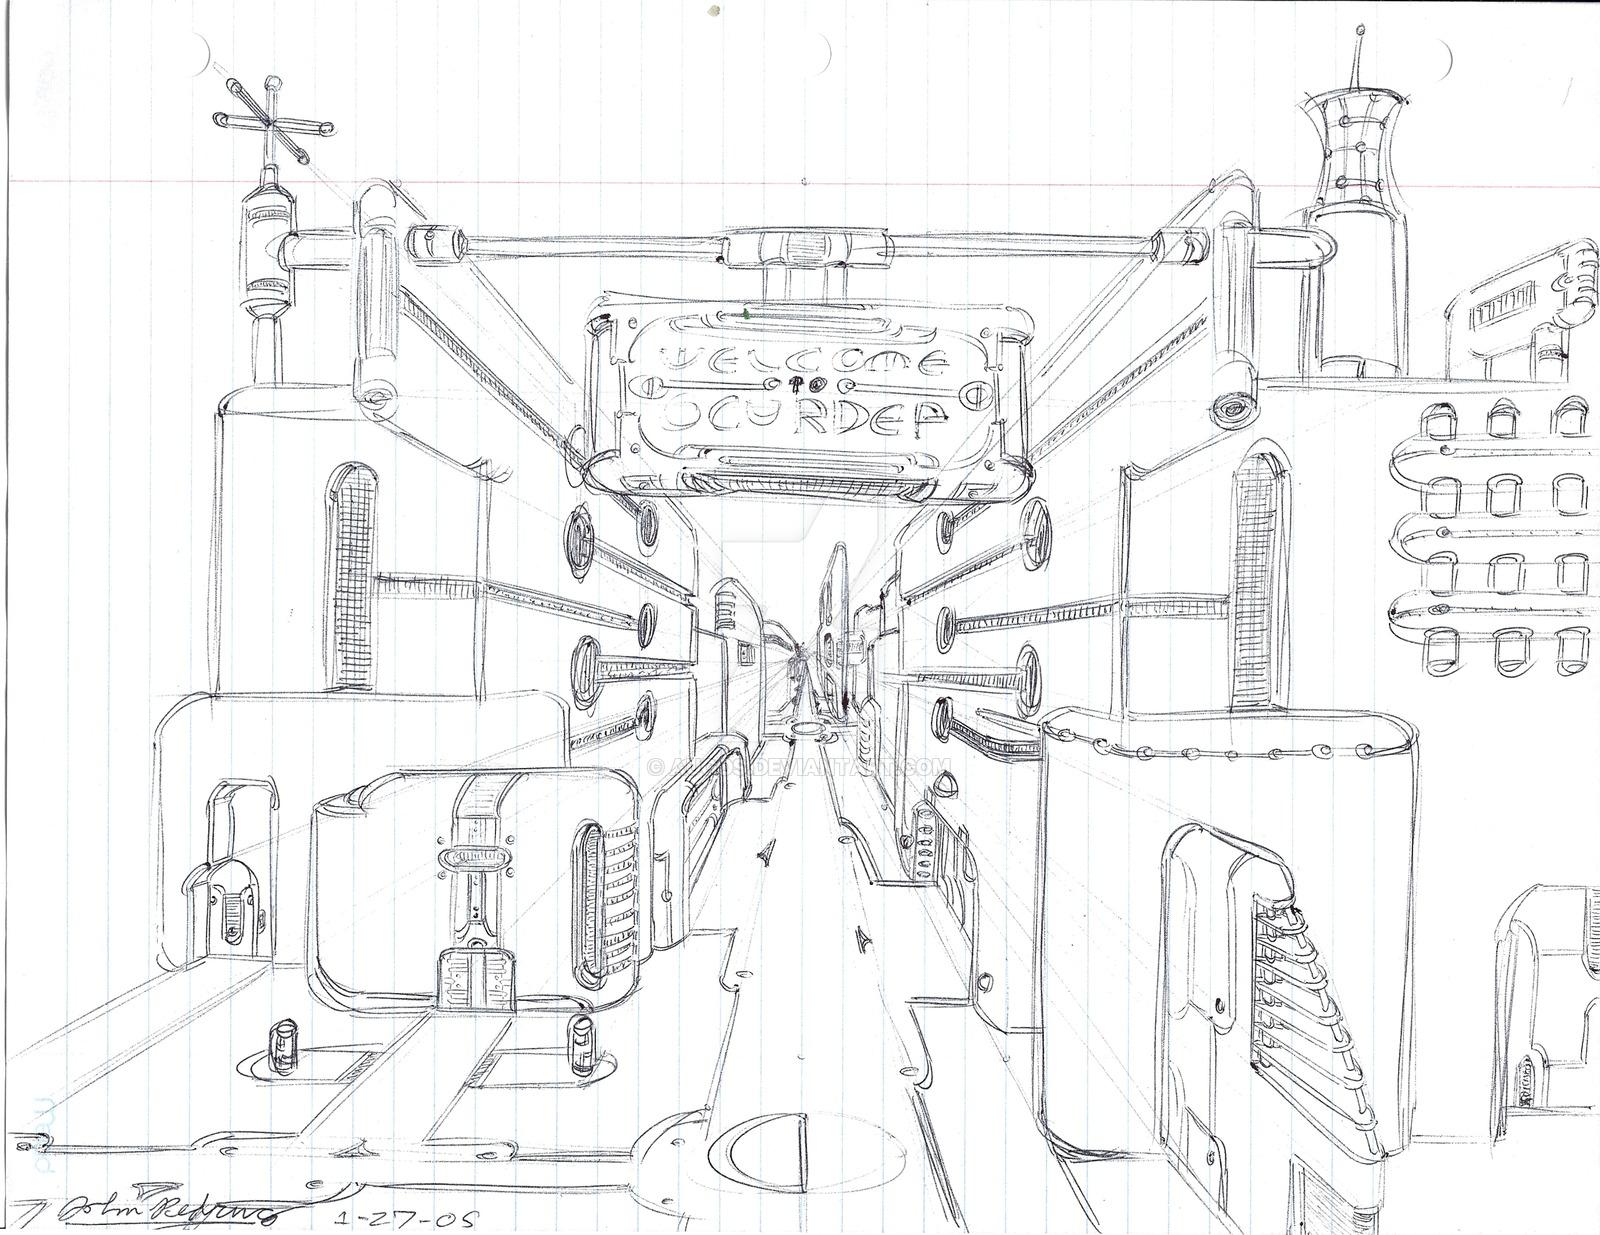 1600x1235 Futuristic Cityscape Doodle 1 By Augos